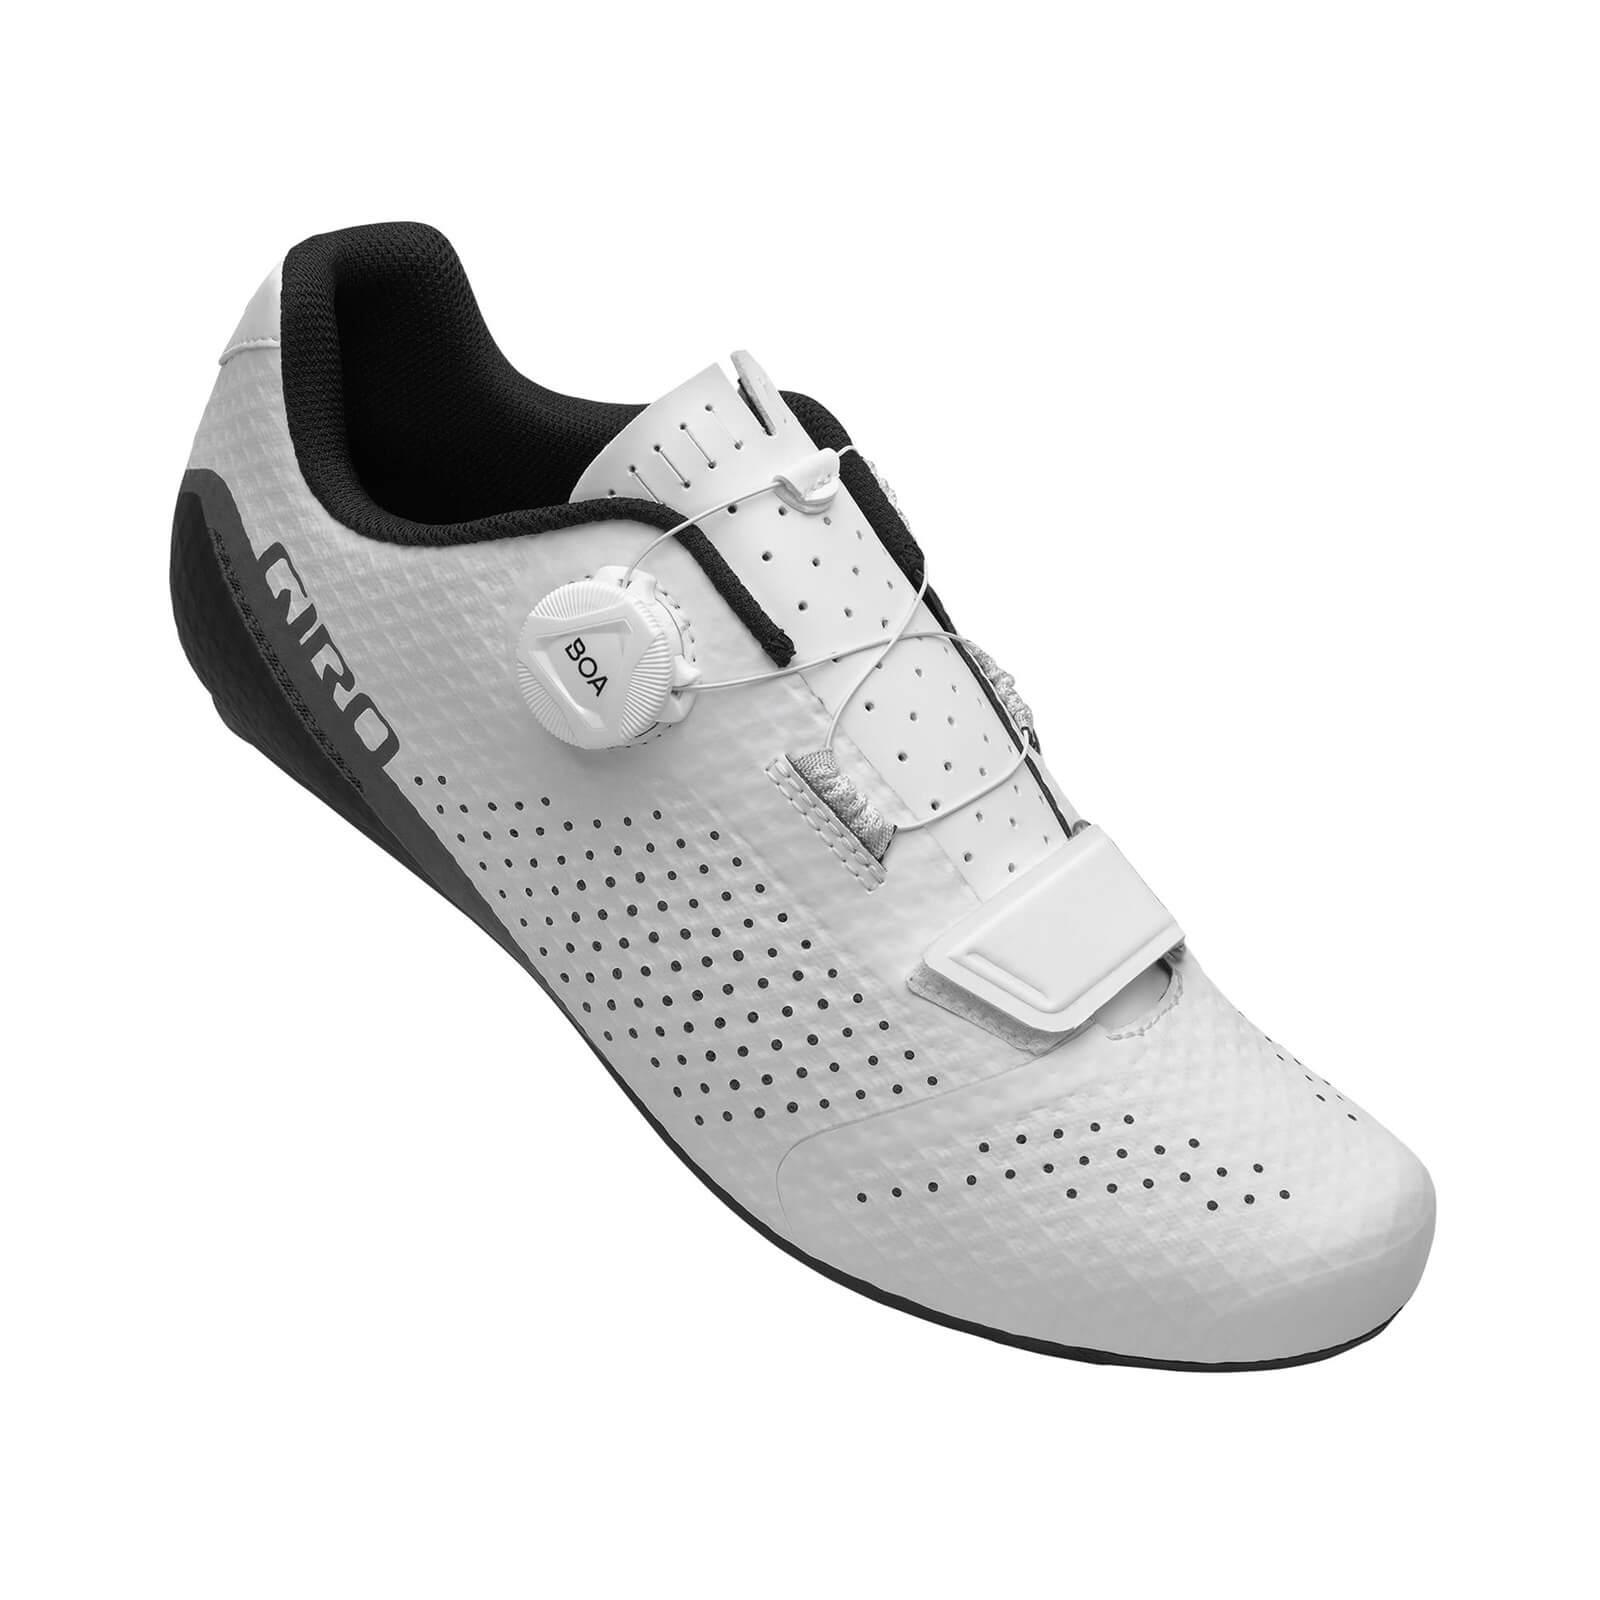 Giro Cadet Road Shoe - EU 42 - Weiß